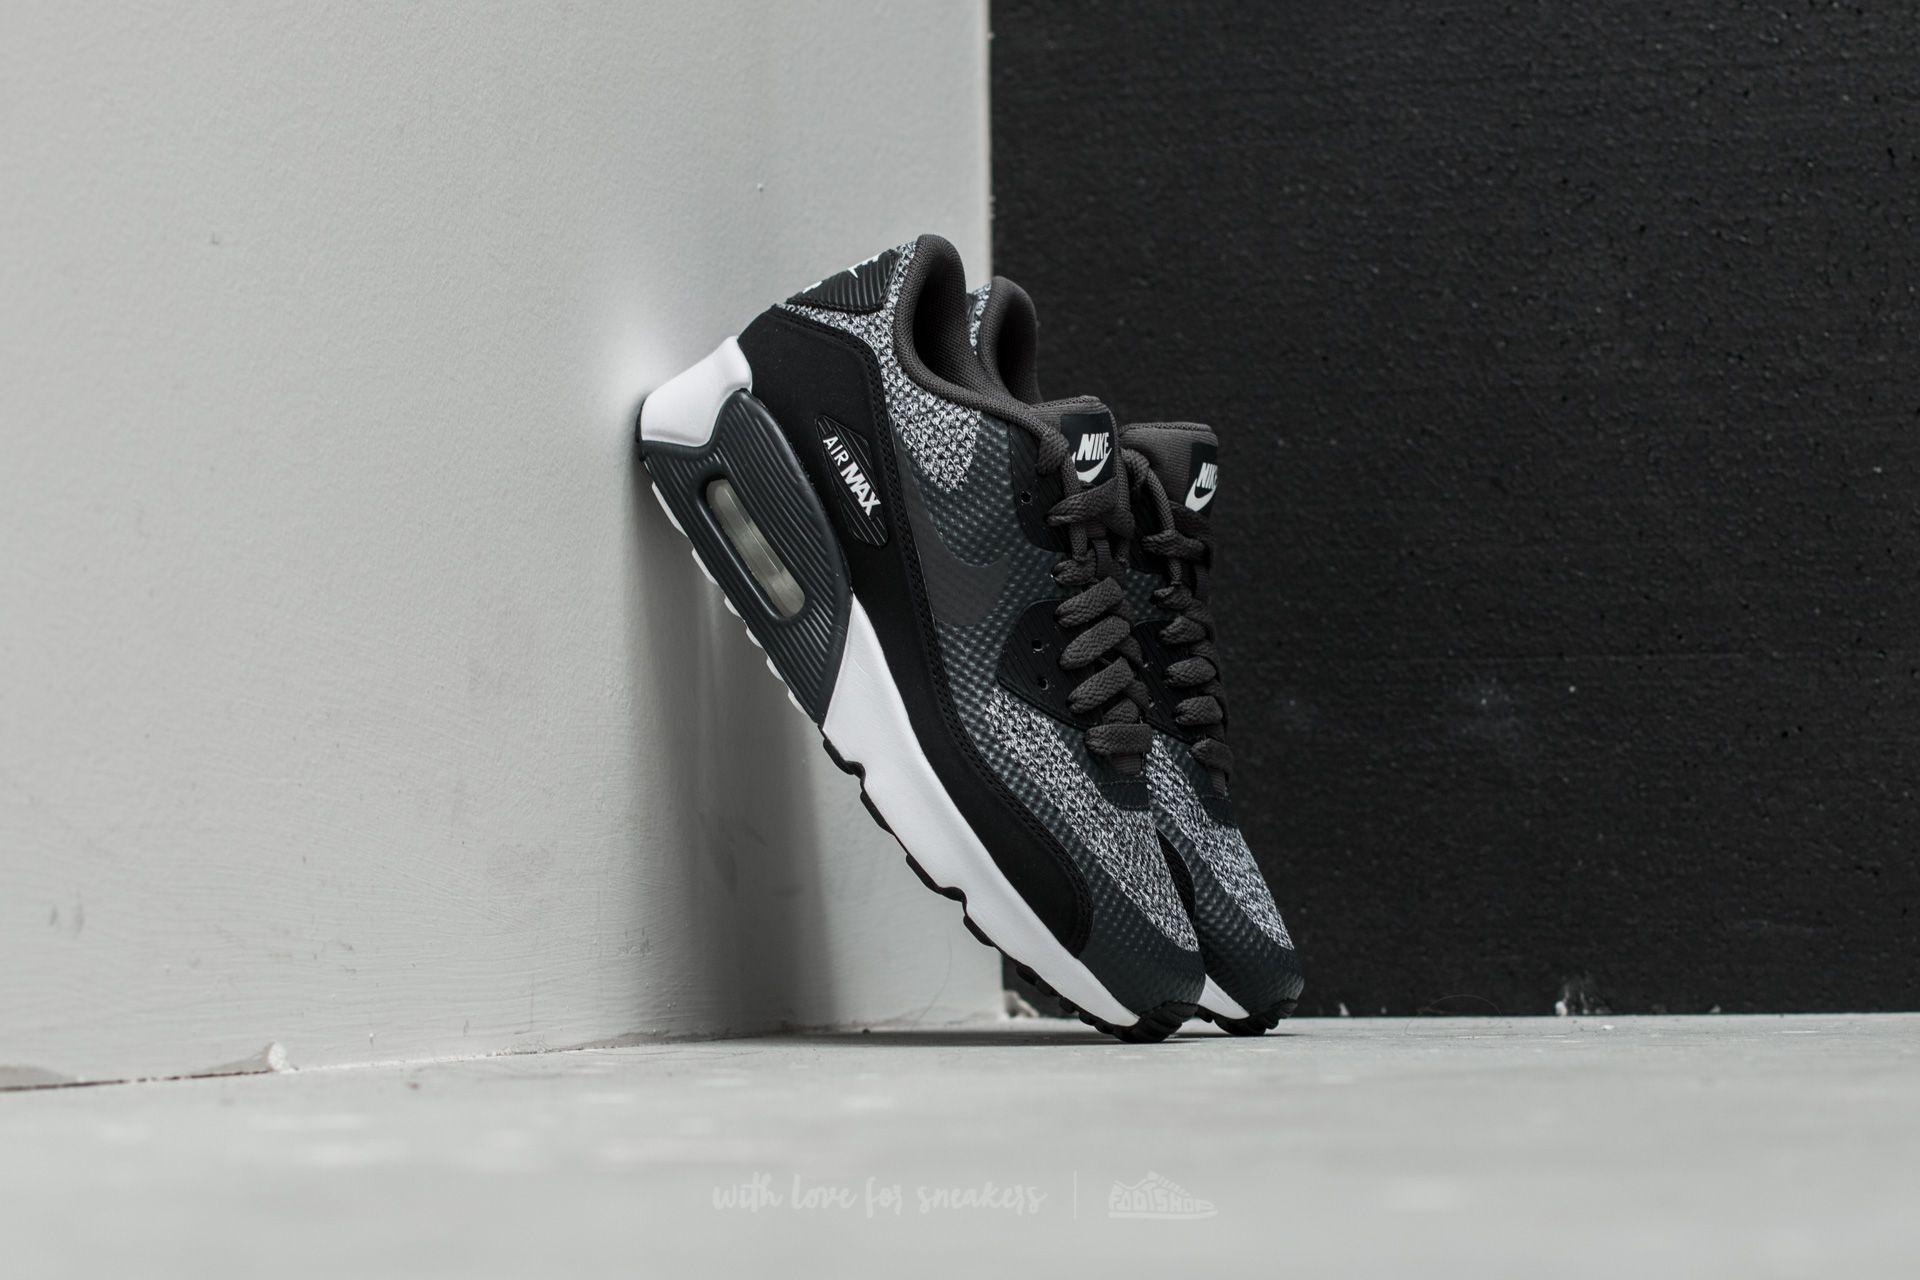 best service fd959 d44db Nike Air Max 90 Ultra 2.0 SE (GS) Anthracite  Black-White-